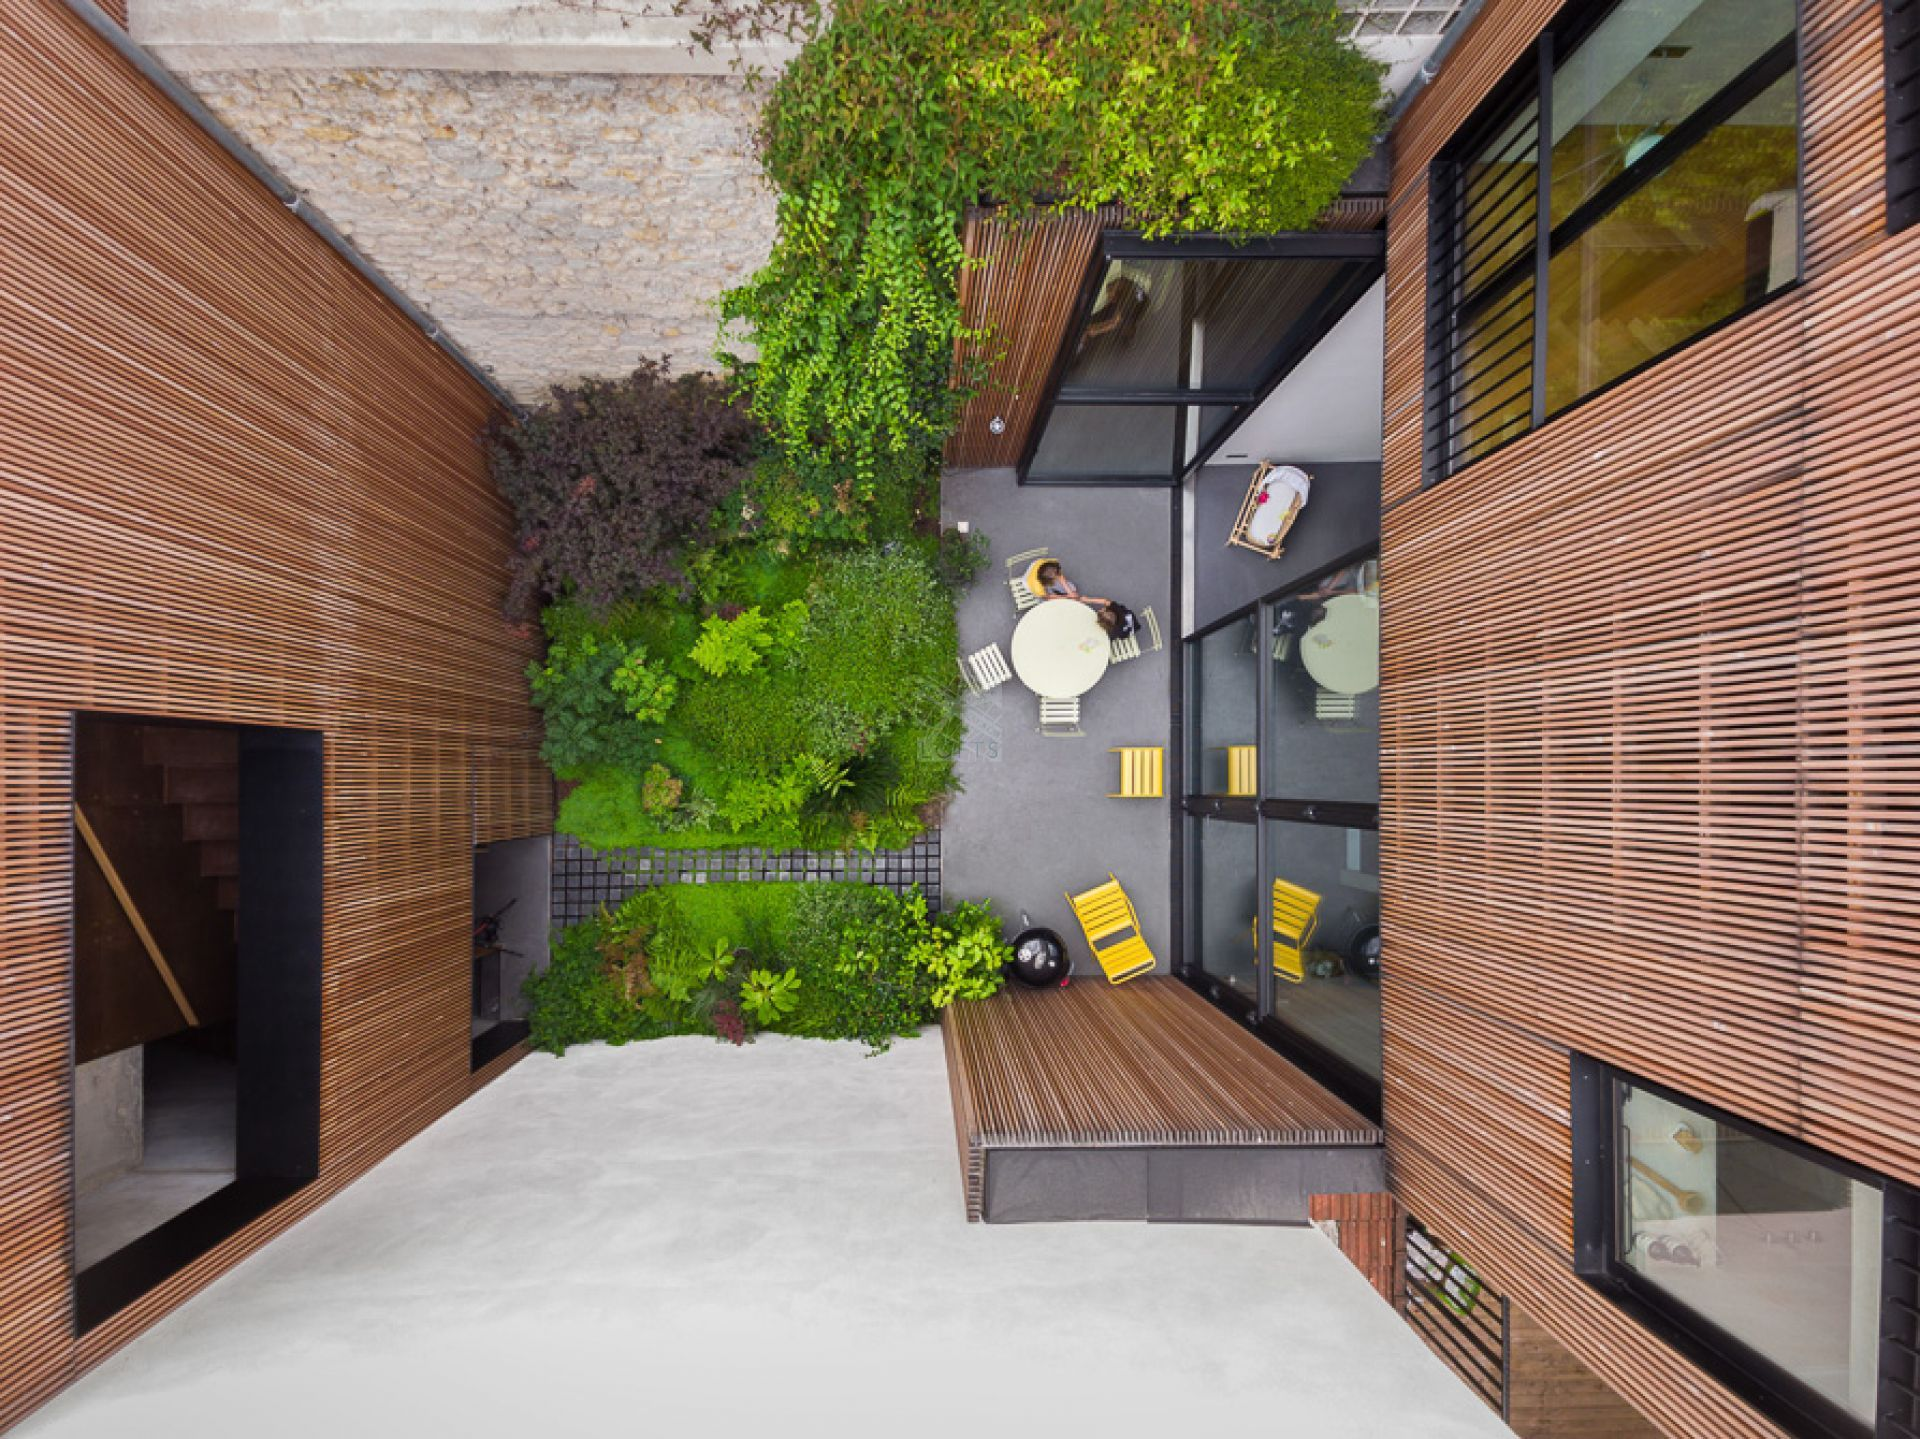 maison d 39 architecte avec terrasse et jardin bagnolet. Black Bedroom Furniture Sets. Home Design Ideas